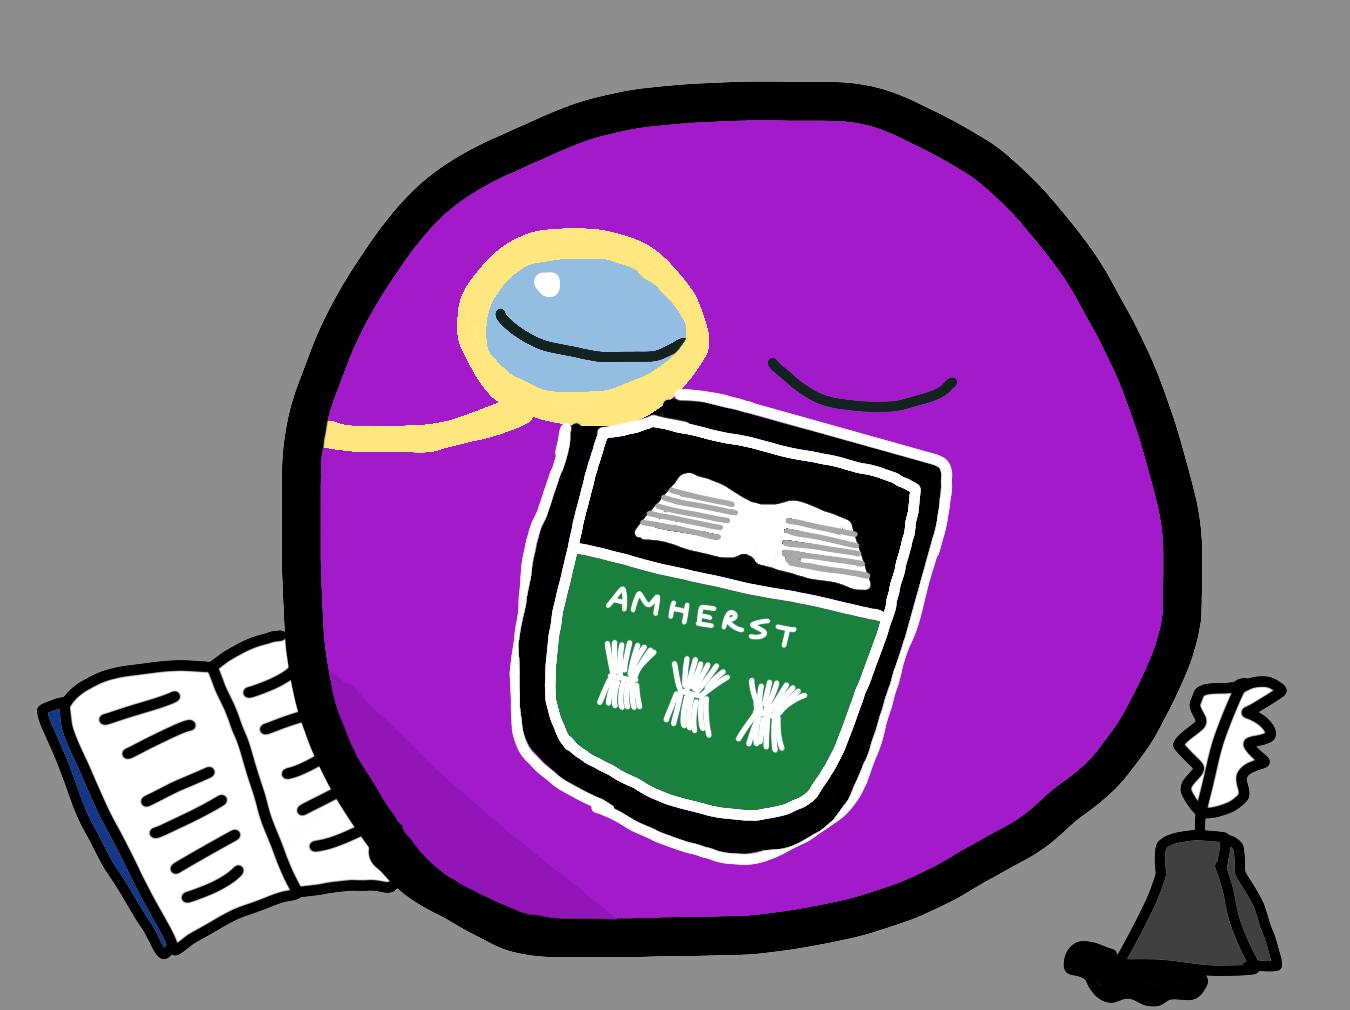 Amherstball